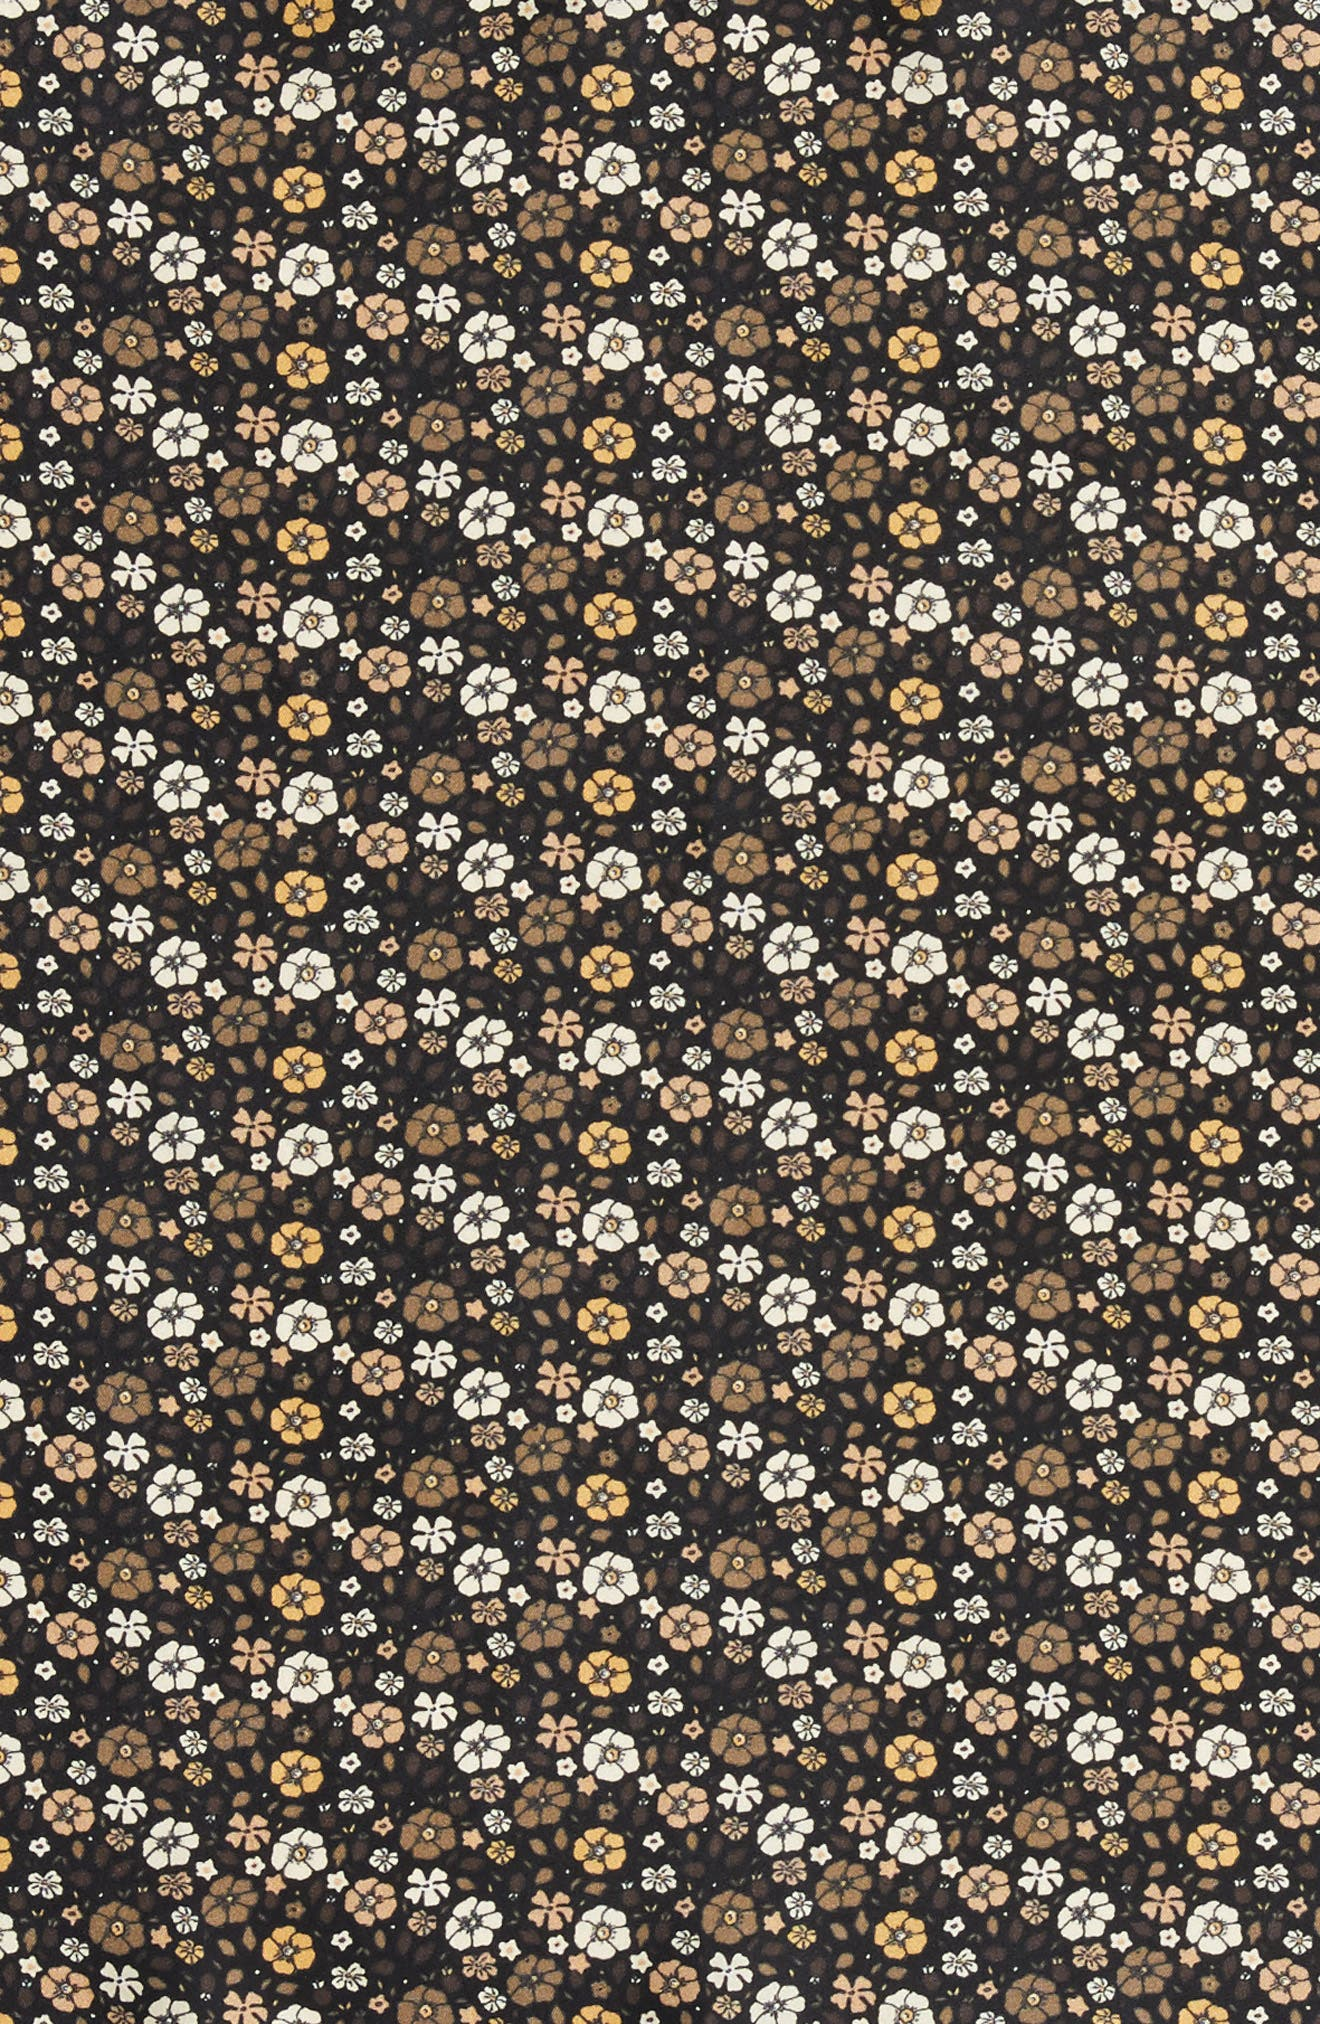 Floral Silk Bandana,                             Alternate thumbnail 4, color,                             001